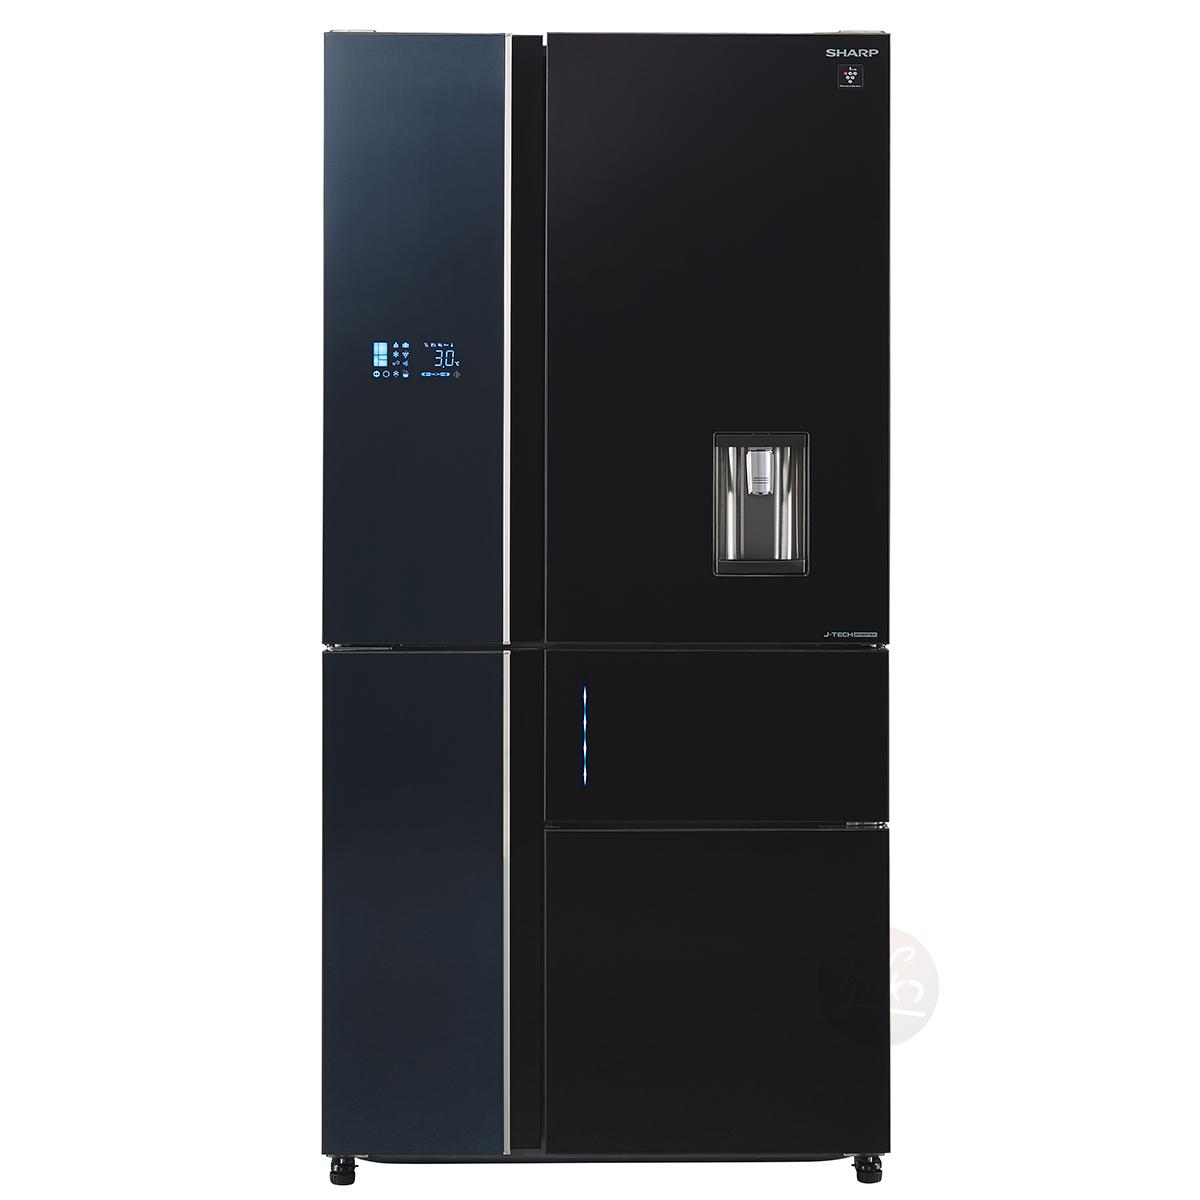 SJ-R9831 מקרר שארפ 5 דלתות